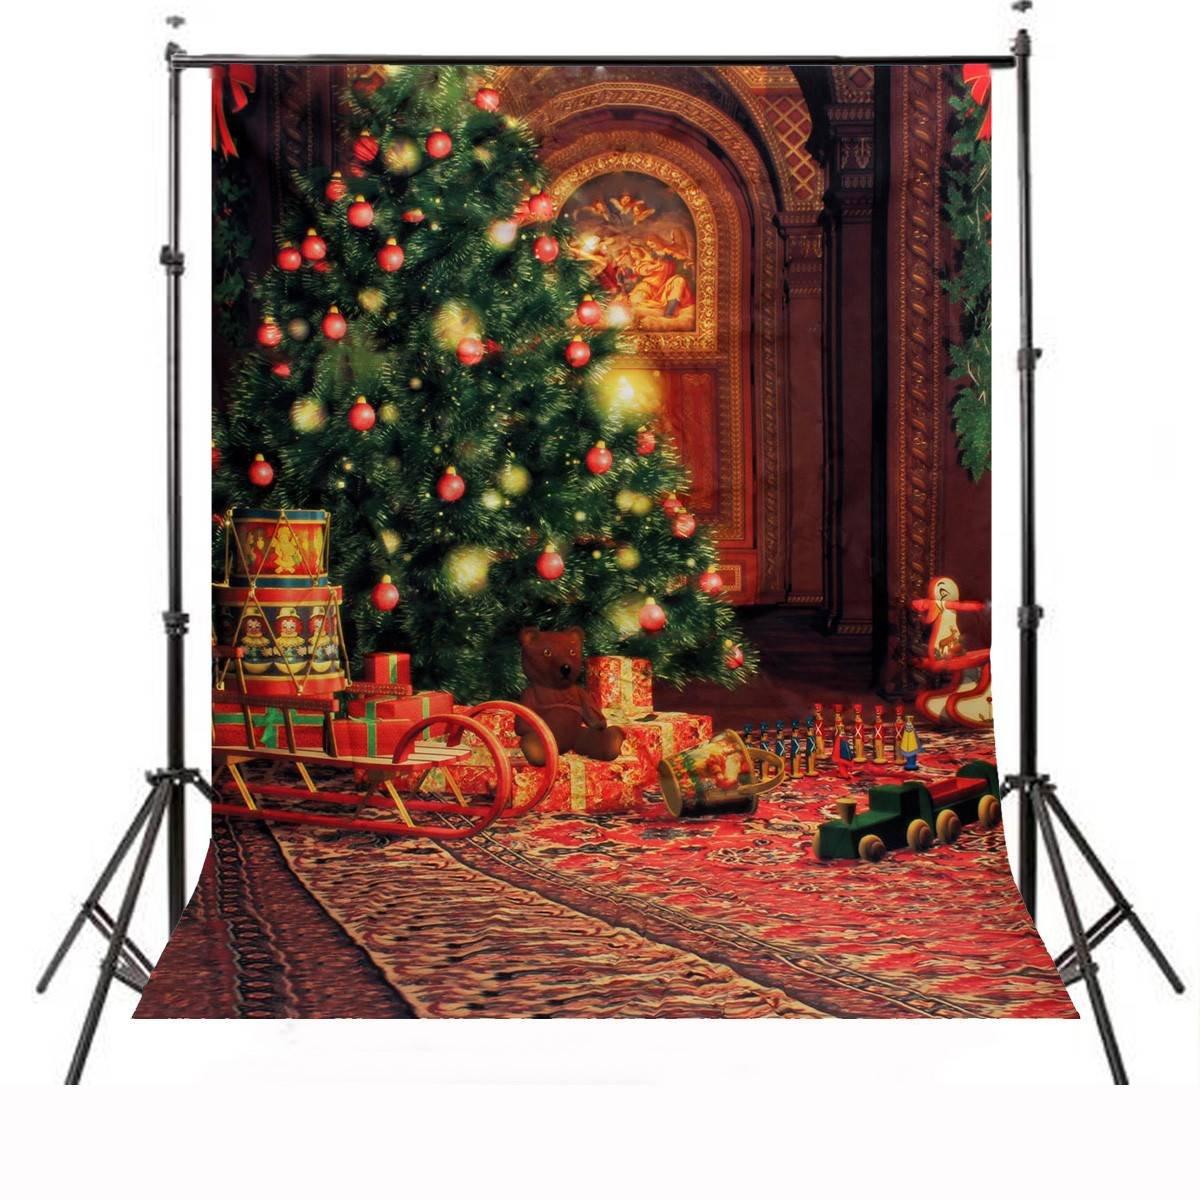 amazon com camtoa 7x5ft christmas pictorial cloth customized